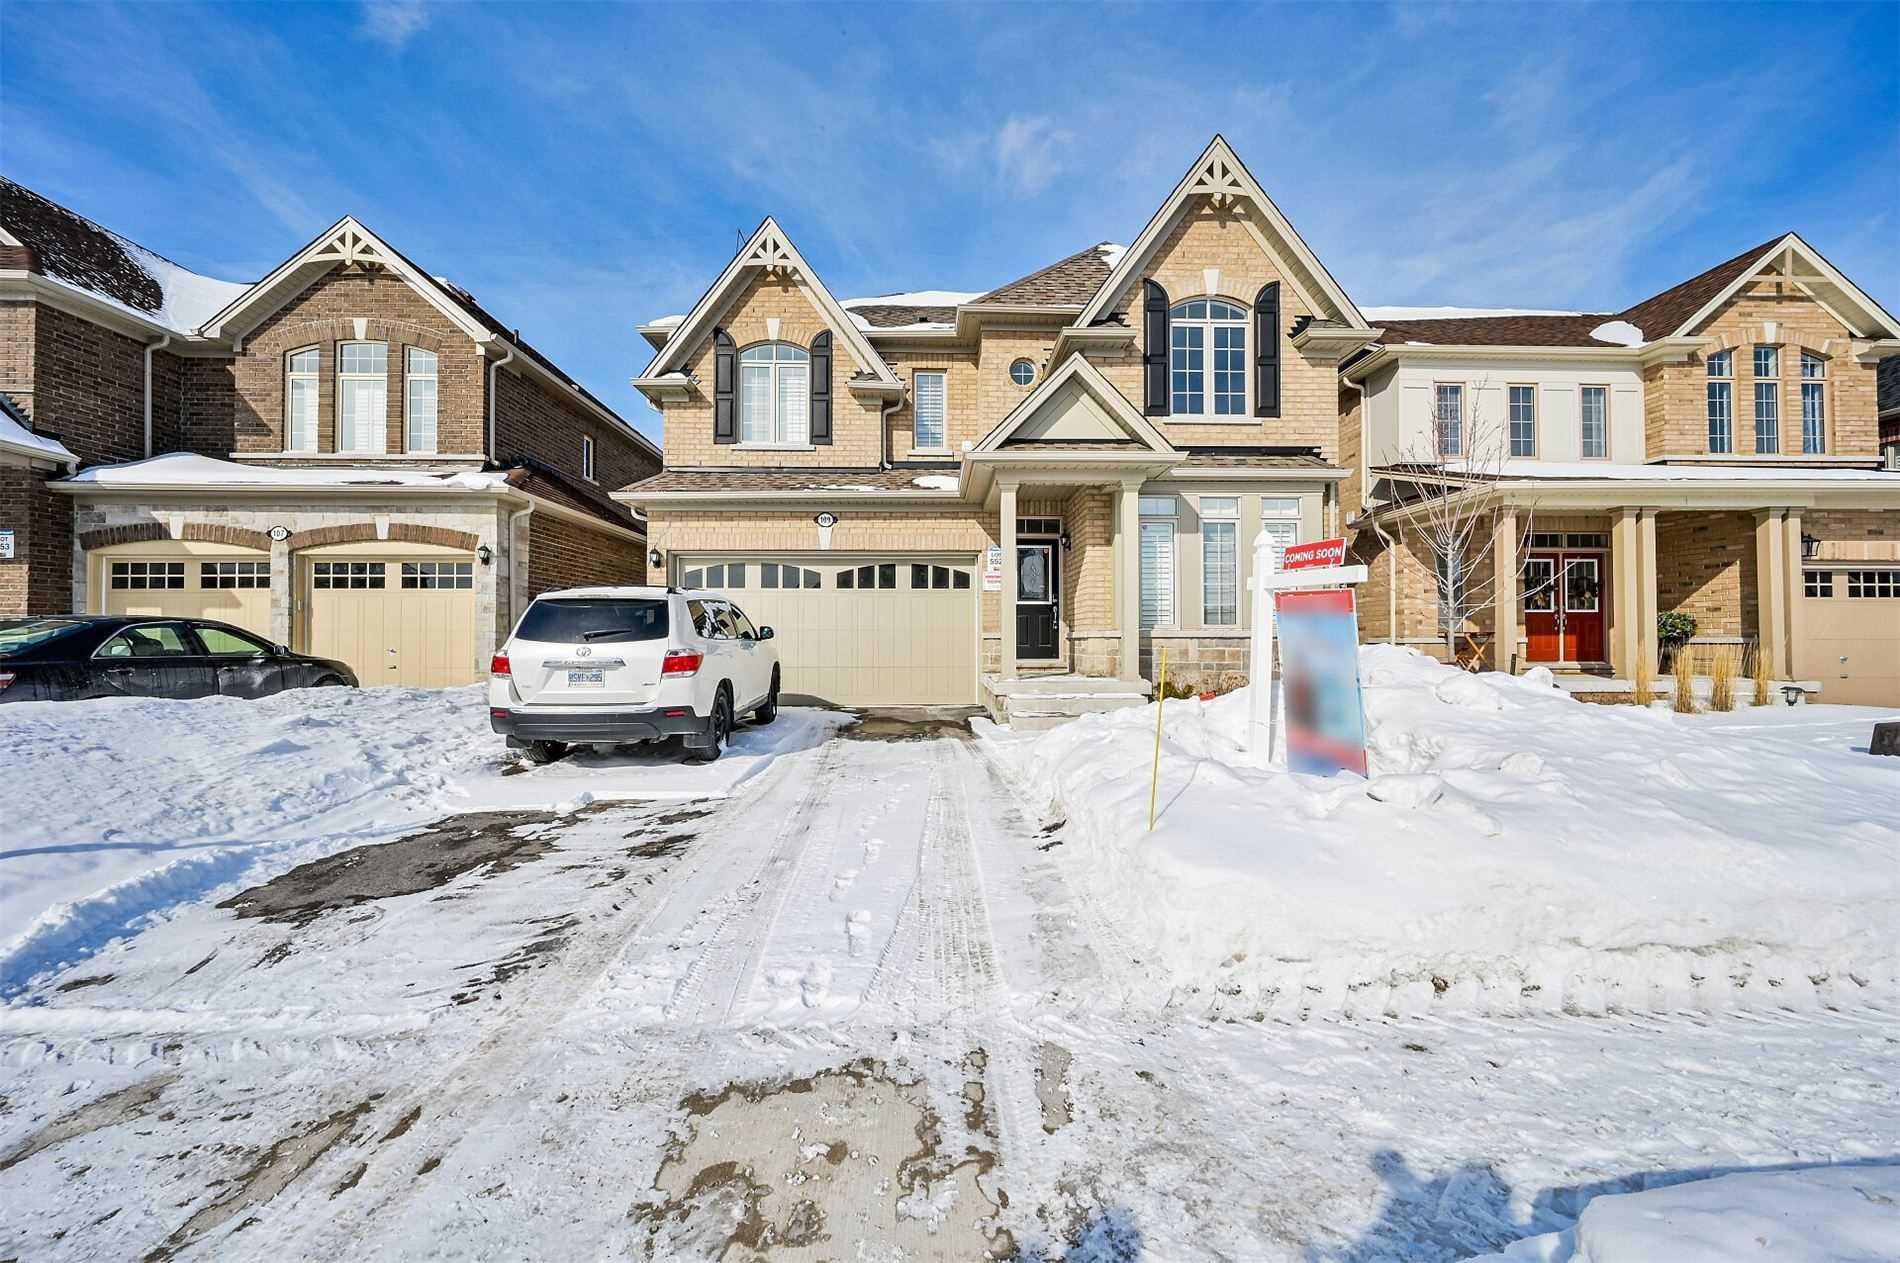 109 Trail Blvd, Springwater Township Ontario, Canada